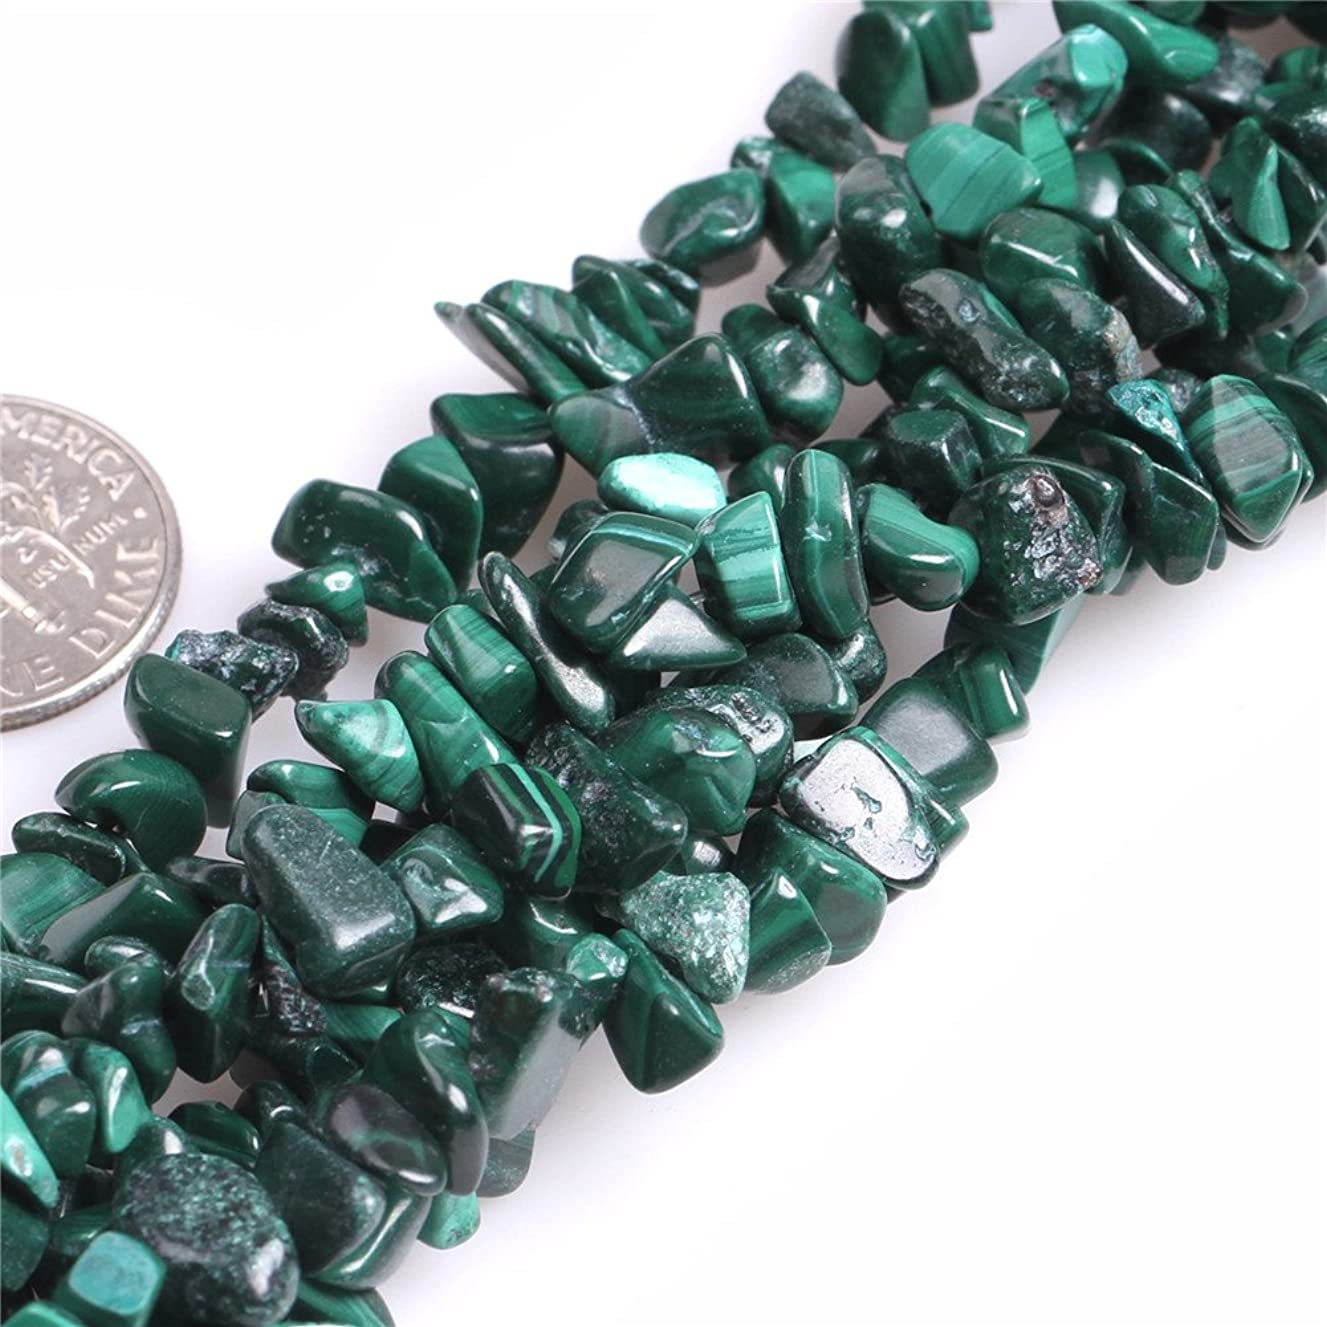 JOE FOREMAN 7-8mm Malachite Semi Precious Gemstone Chips Loose Beads for Jewelry Making DIY Handmade Craft Supplies 34